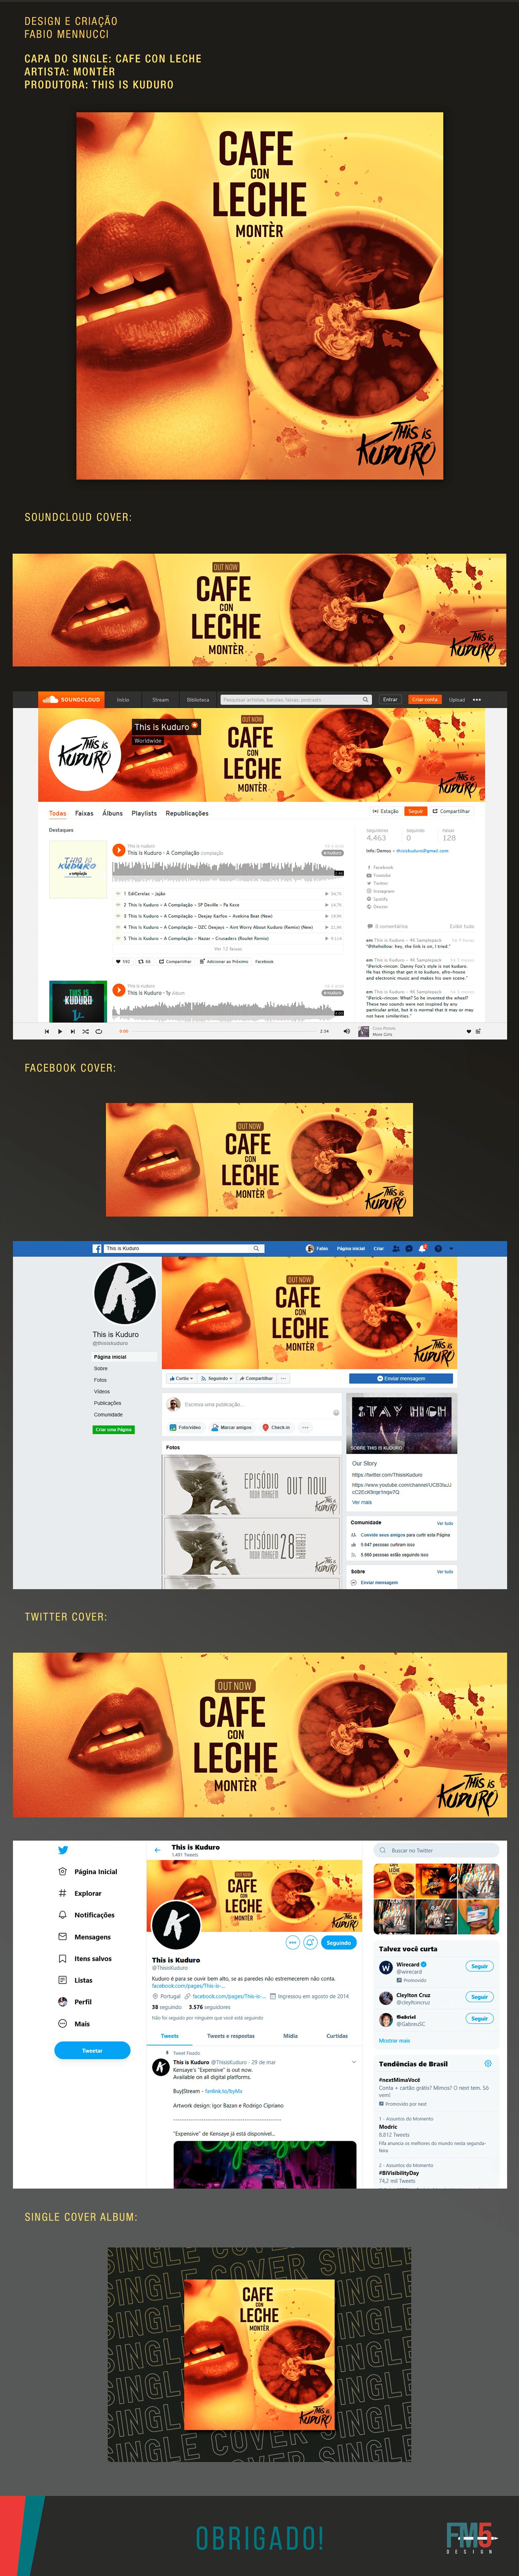 Image may contain: screenshot and fast food